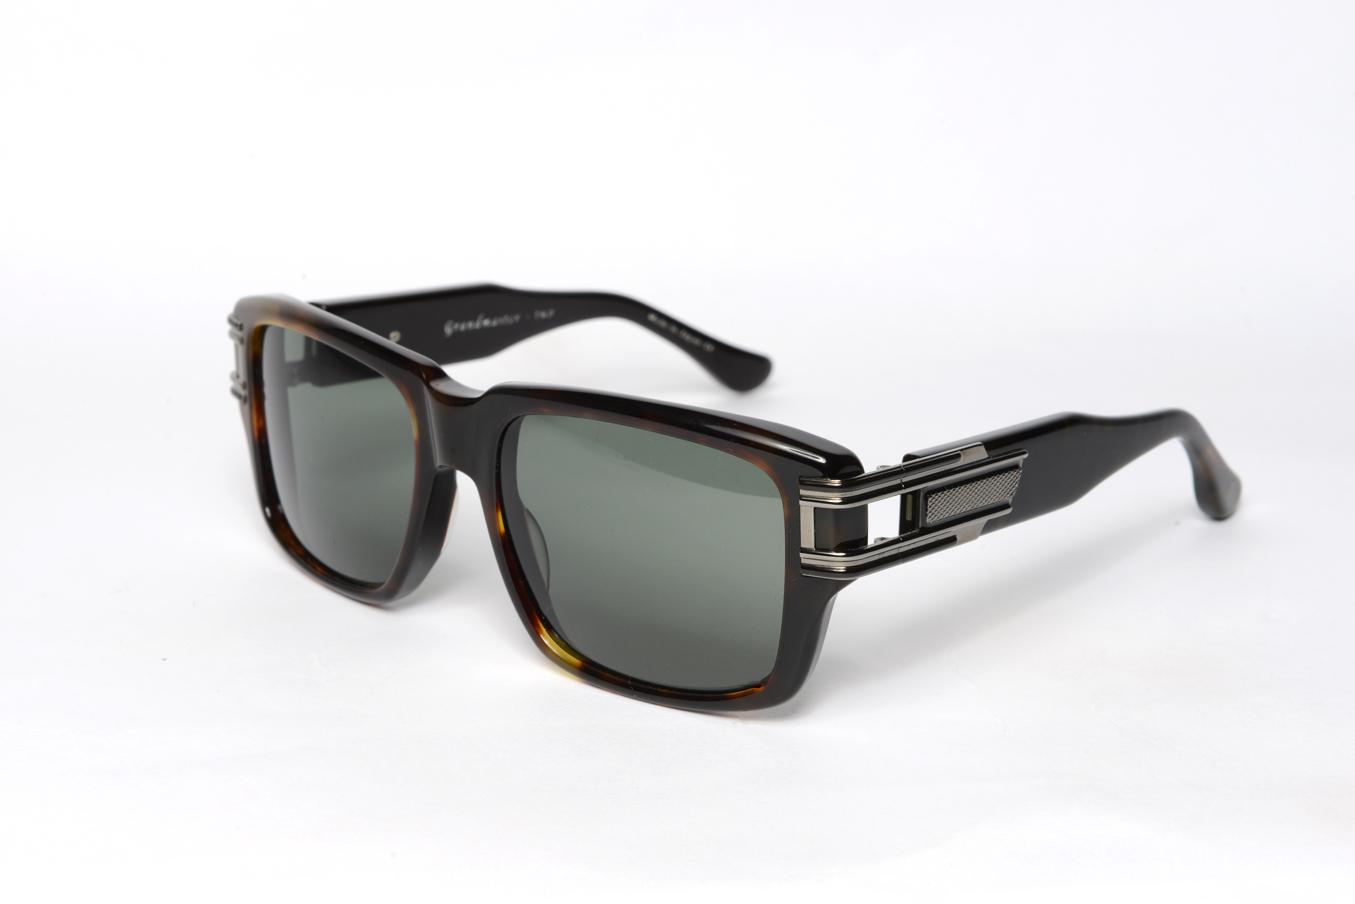 1a2f78926e01 Dita Grandmaster 2 Sunglasses - Piccadilly Opticians -